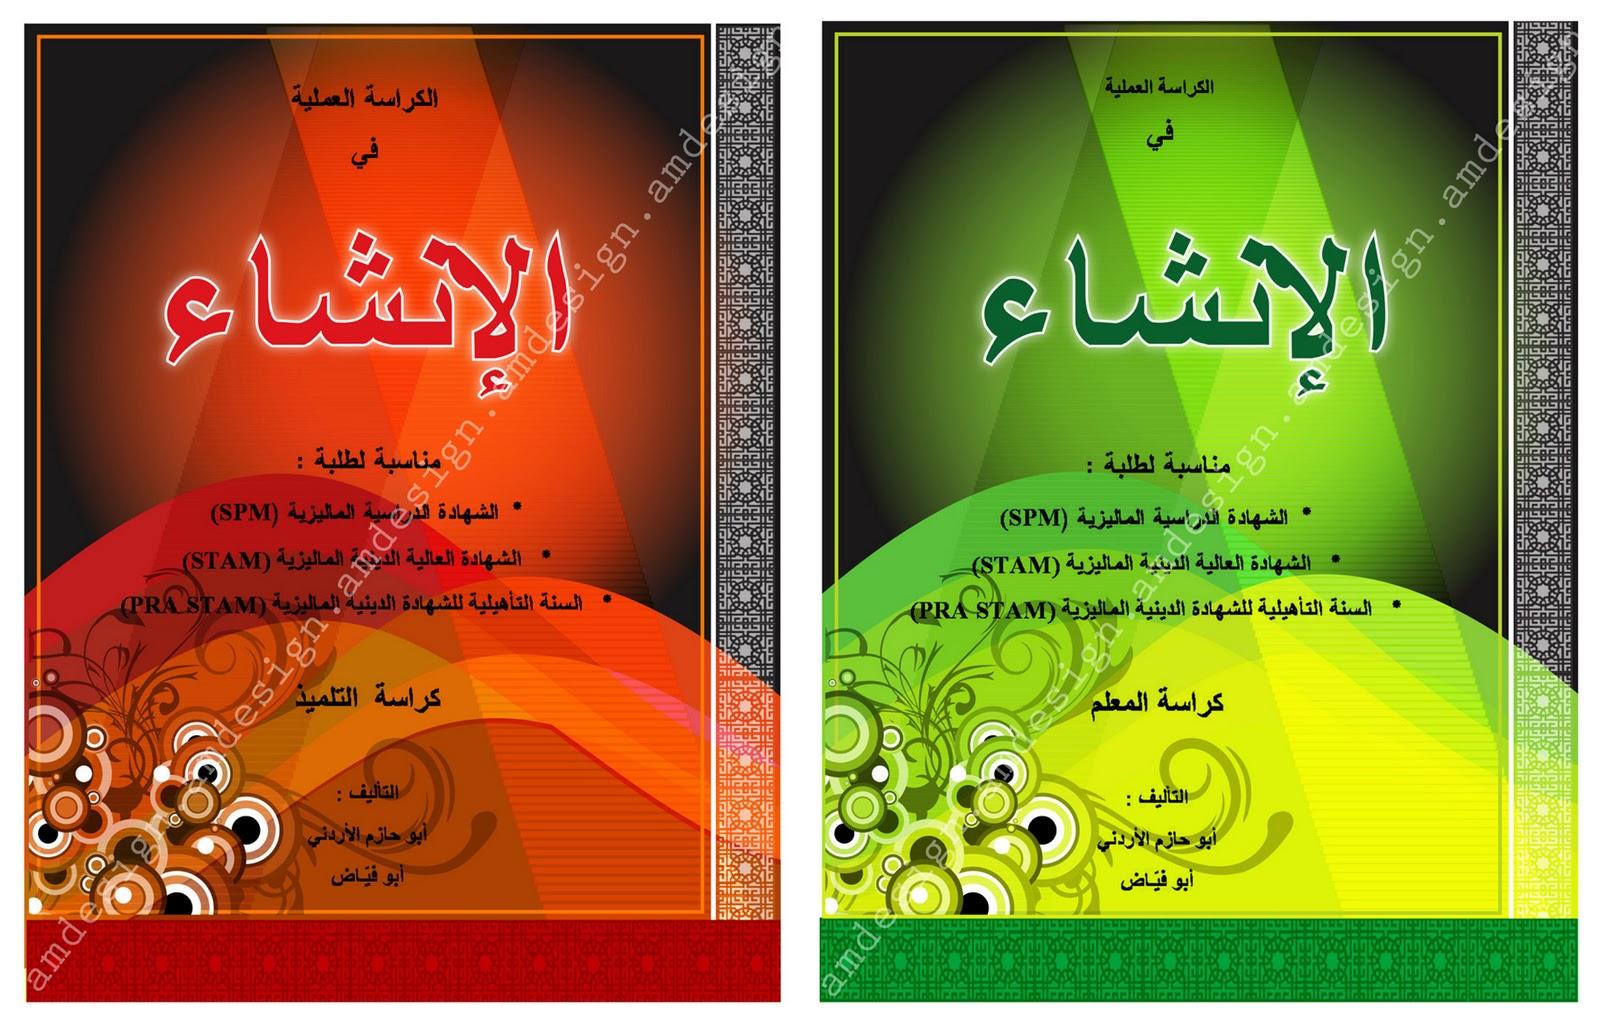 Book Cover Design Freelance ~ Dlova design freelance ad designer latihan spm stam